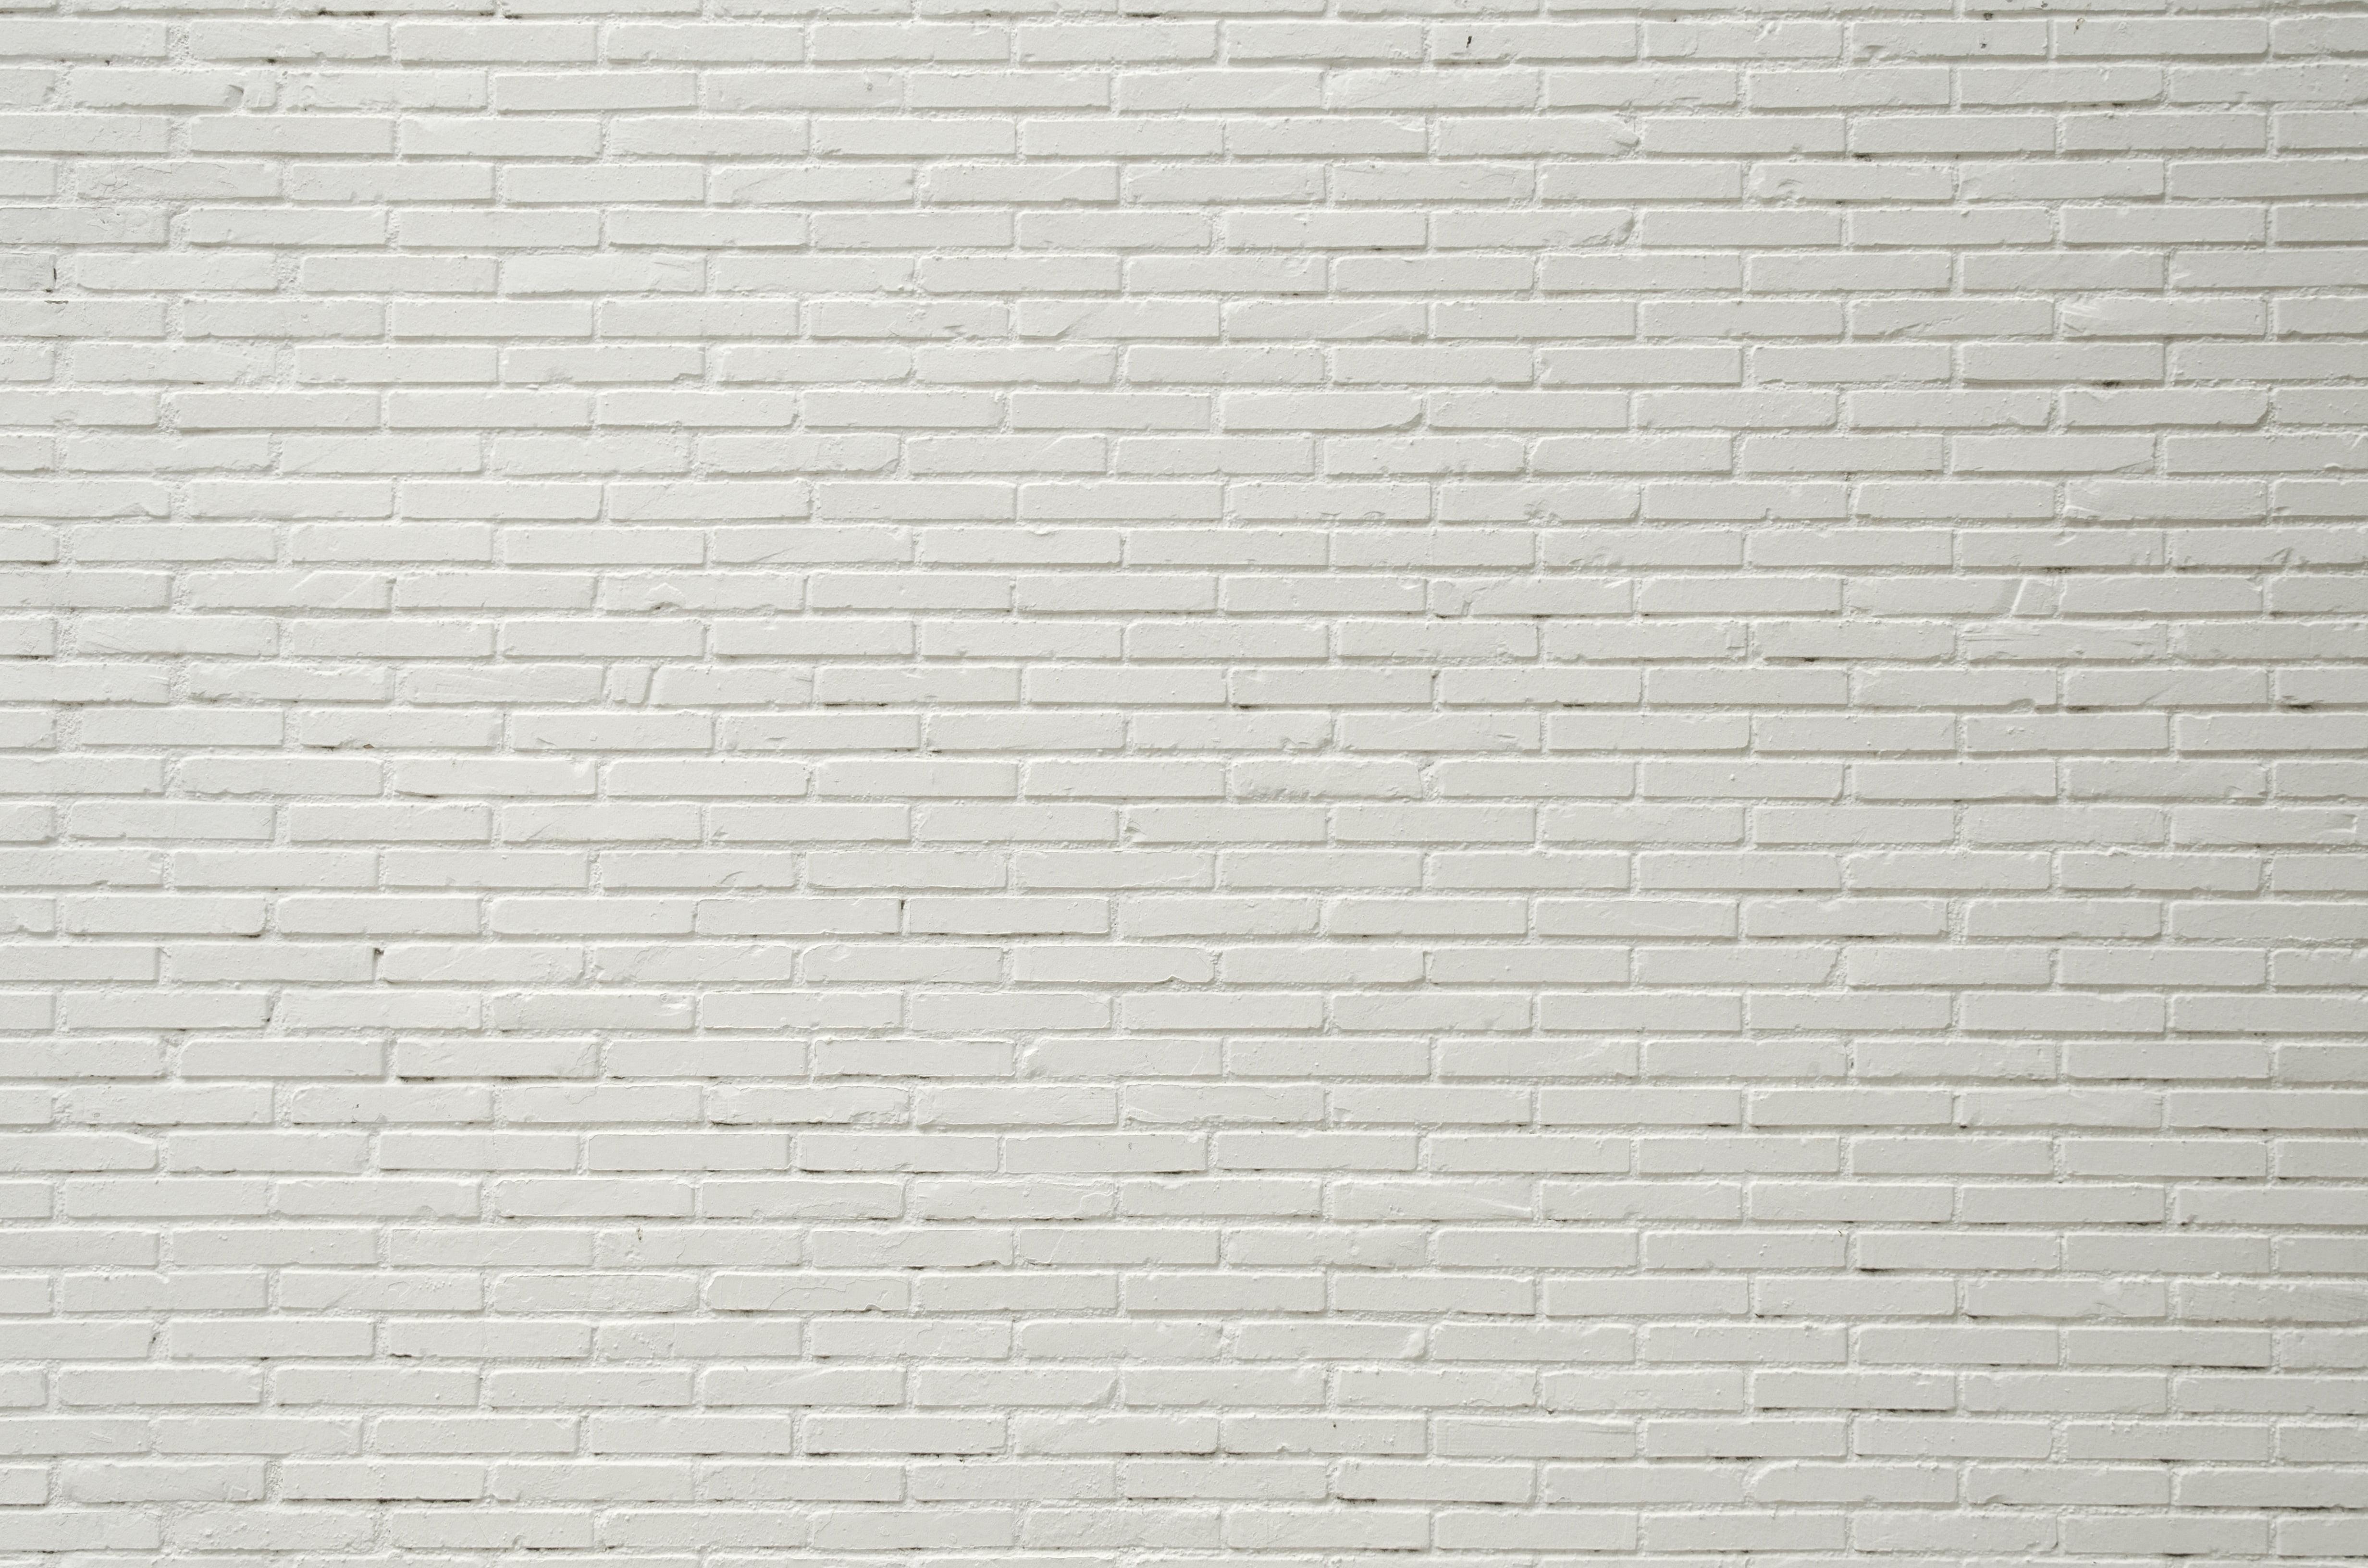 Gray Concrete Brick Wall Hd Wallpaper White Brick Wall Free 966271 Hd Wallpaper Backgrounds Download